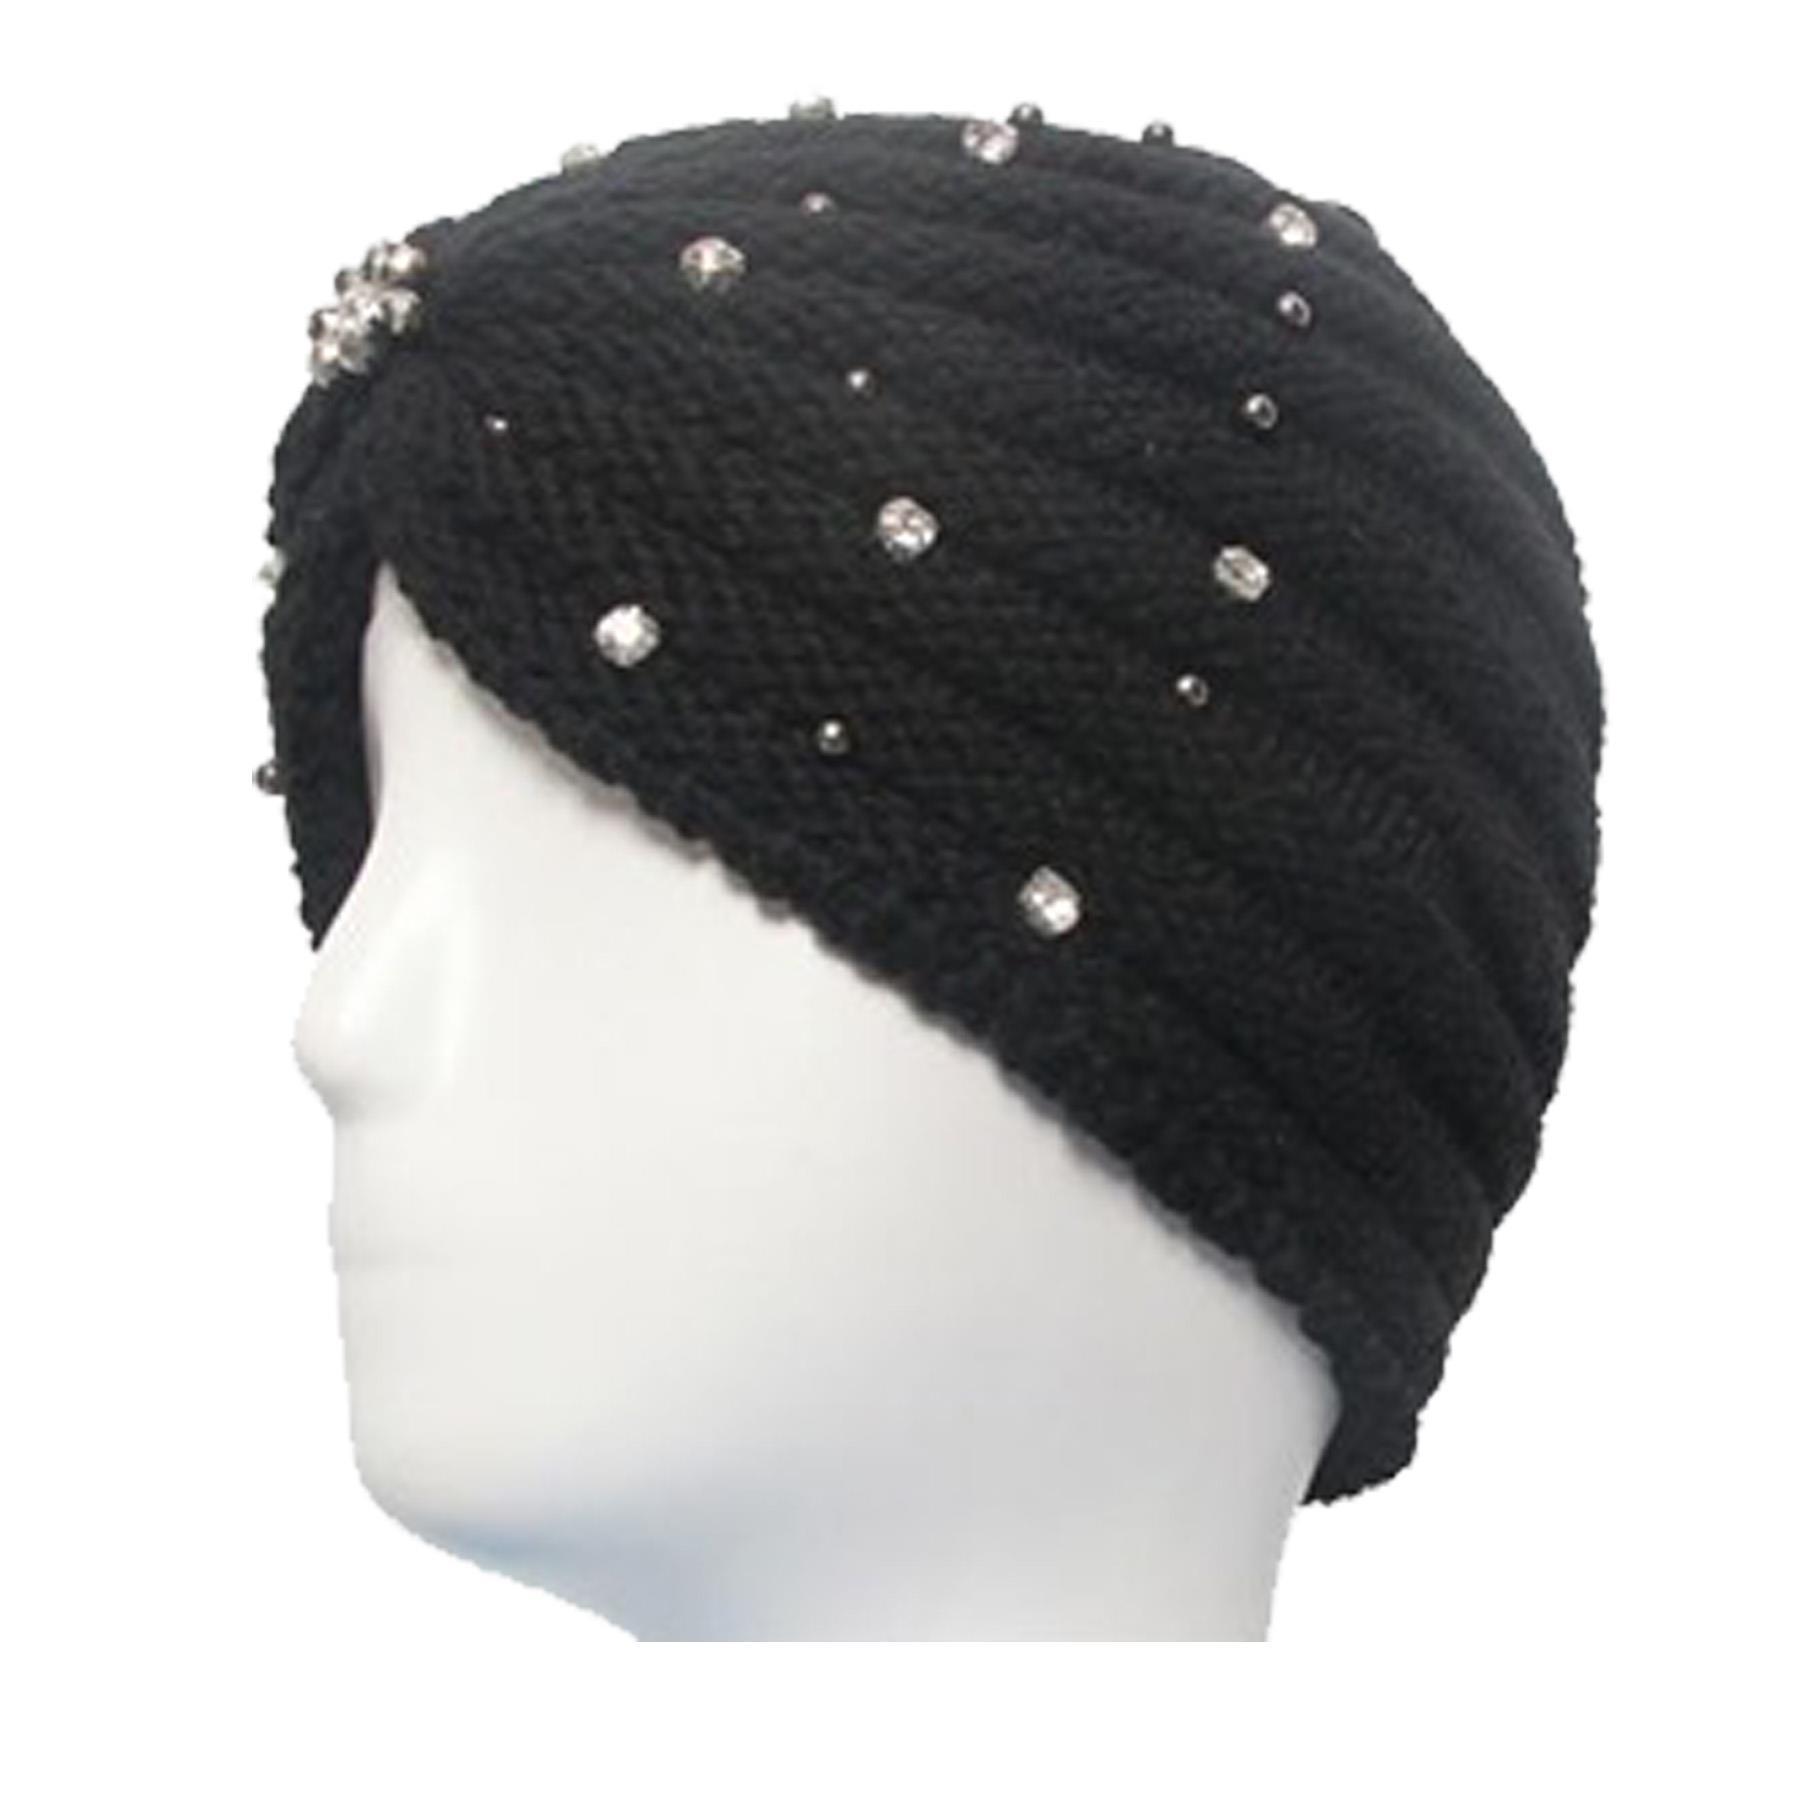 New-Women-s-Pleated-Knitted-Acrylic-Jewel-Detail-Headwear-Turban-Cap thumbnail 12